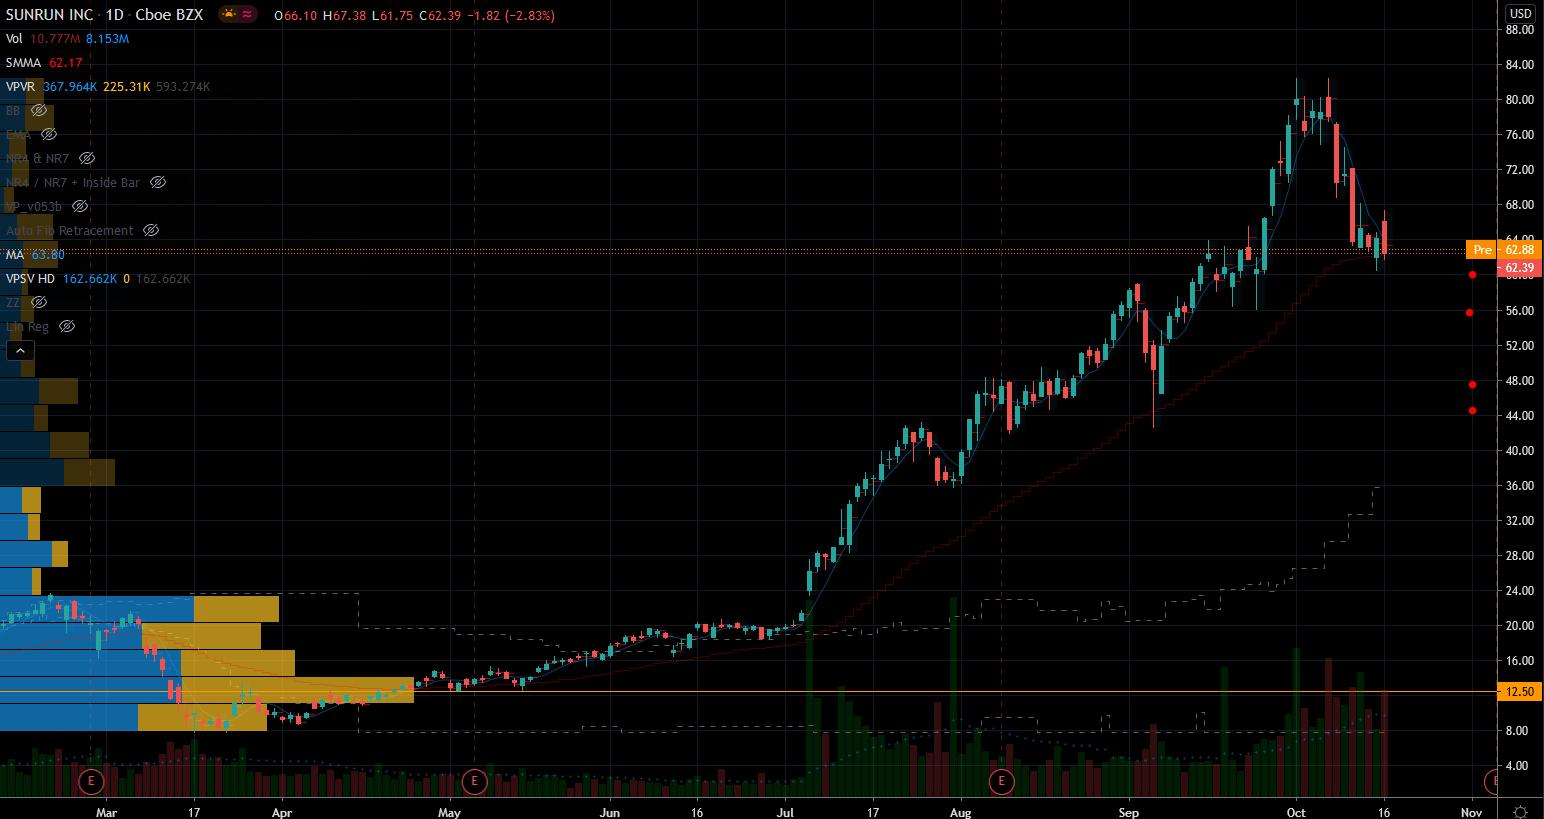 Hot Stocks: Sunrun (RUN) Stock Chart Showing Support Below